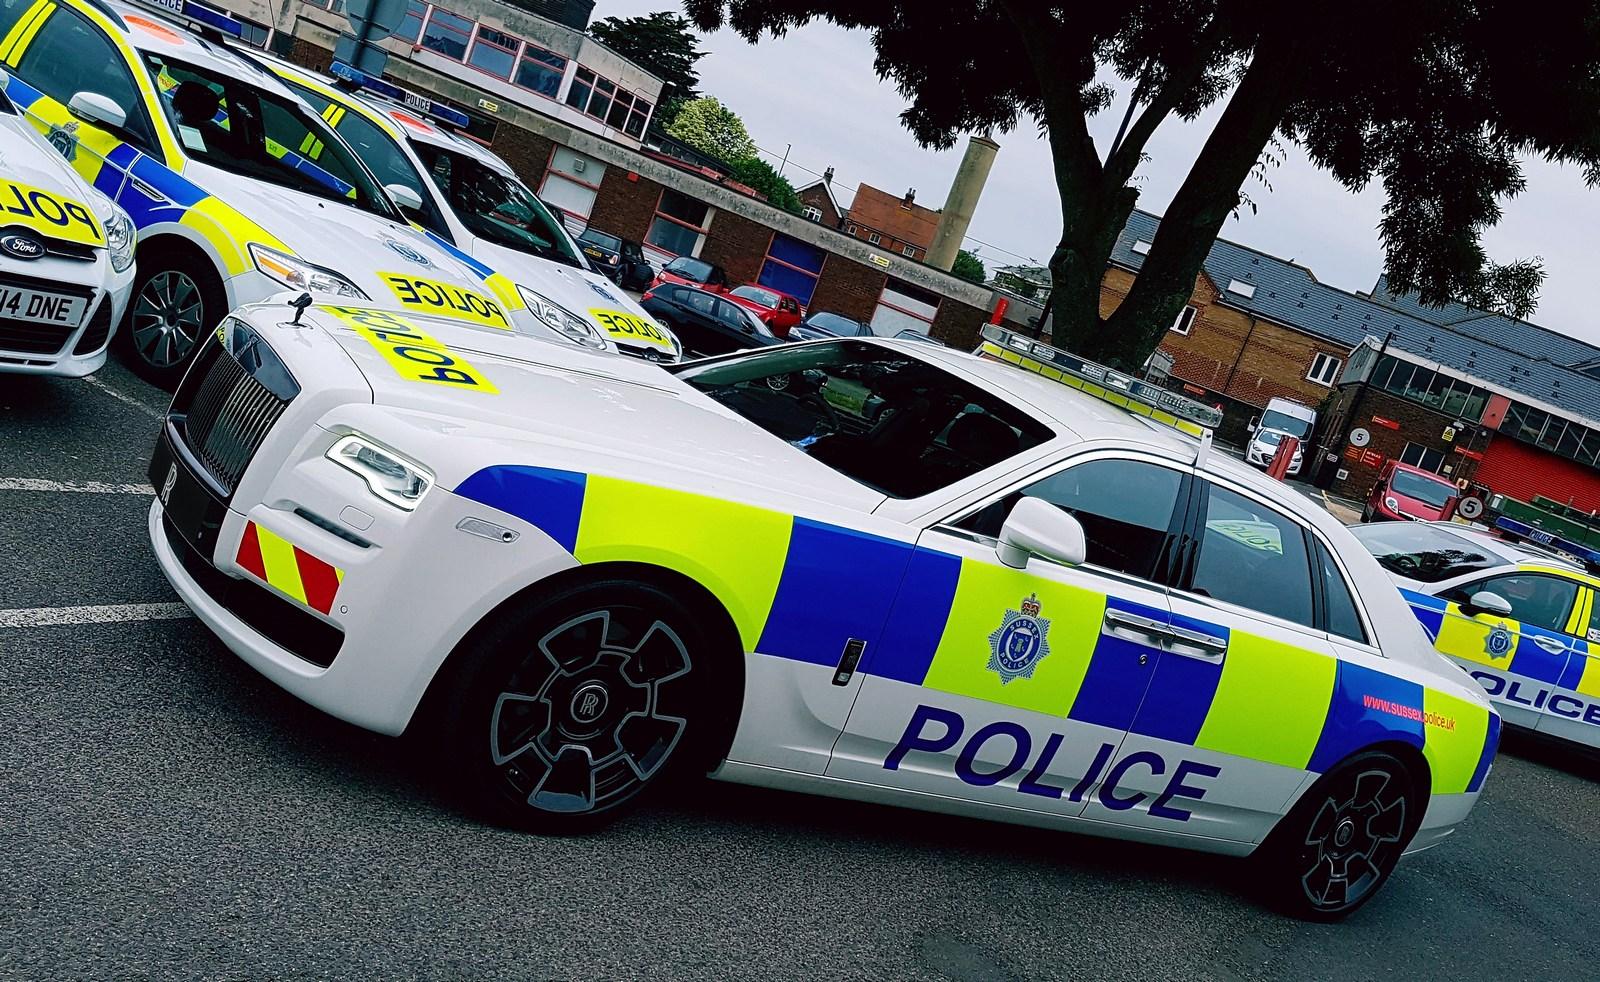 Rolls Royce Creates A One Off Ghost Black Badge Police Car